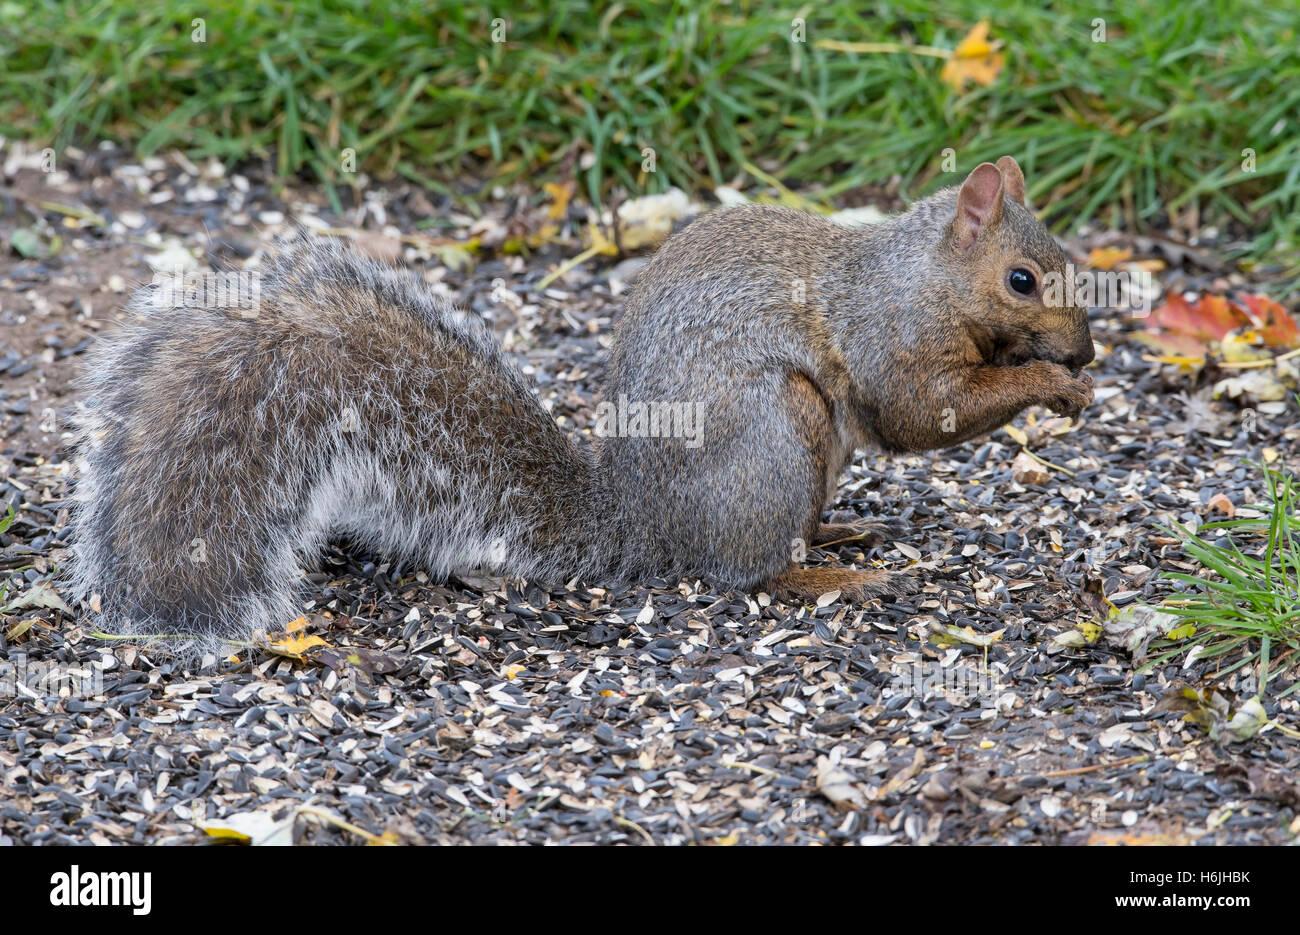 Eastern Fox Squirrel (Sciurus niger) eating bird seed on ground near feeder, Autumn, E North America - Stock Image